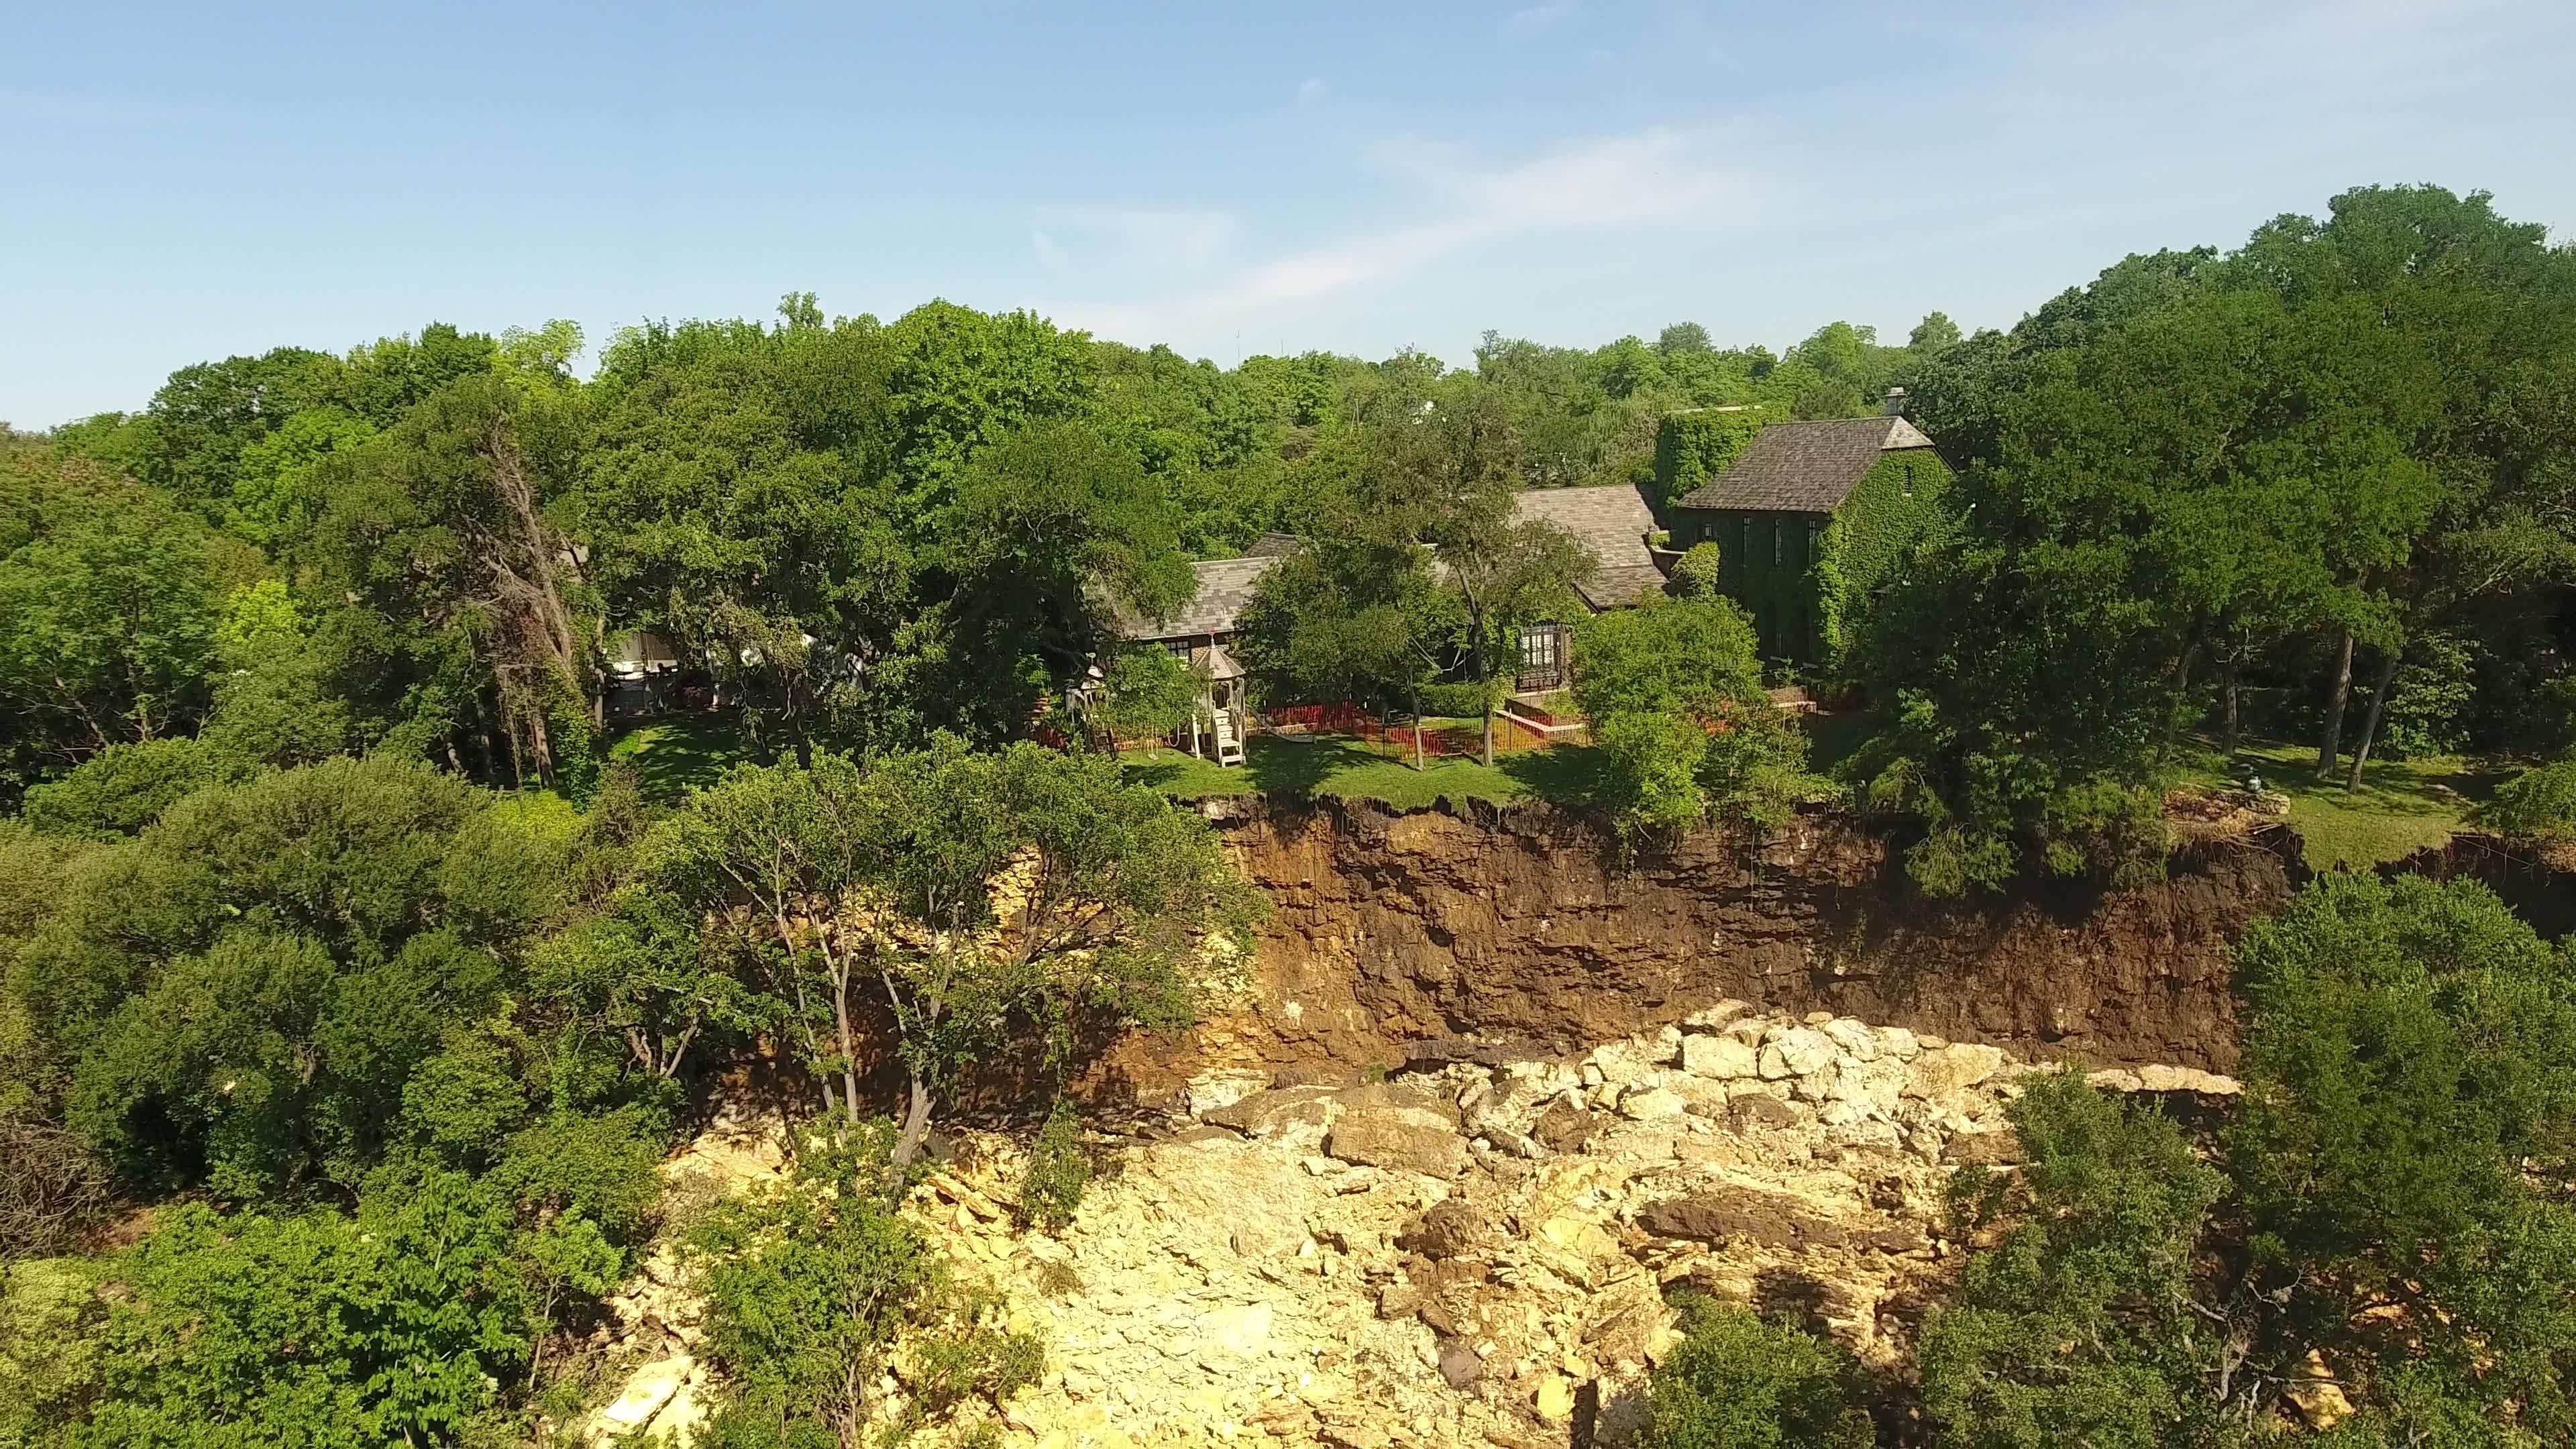 Group in charge of Shoal Creek landslide repairs asks for